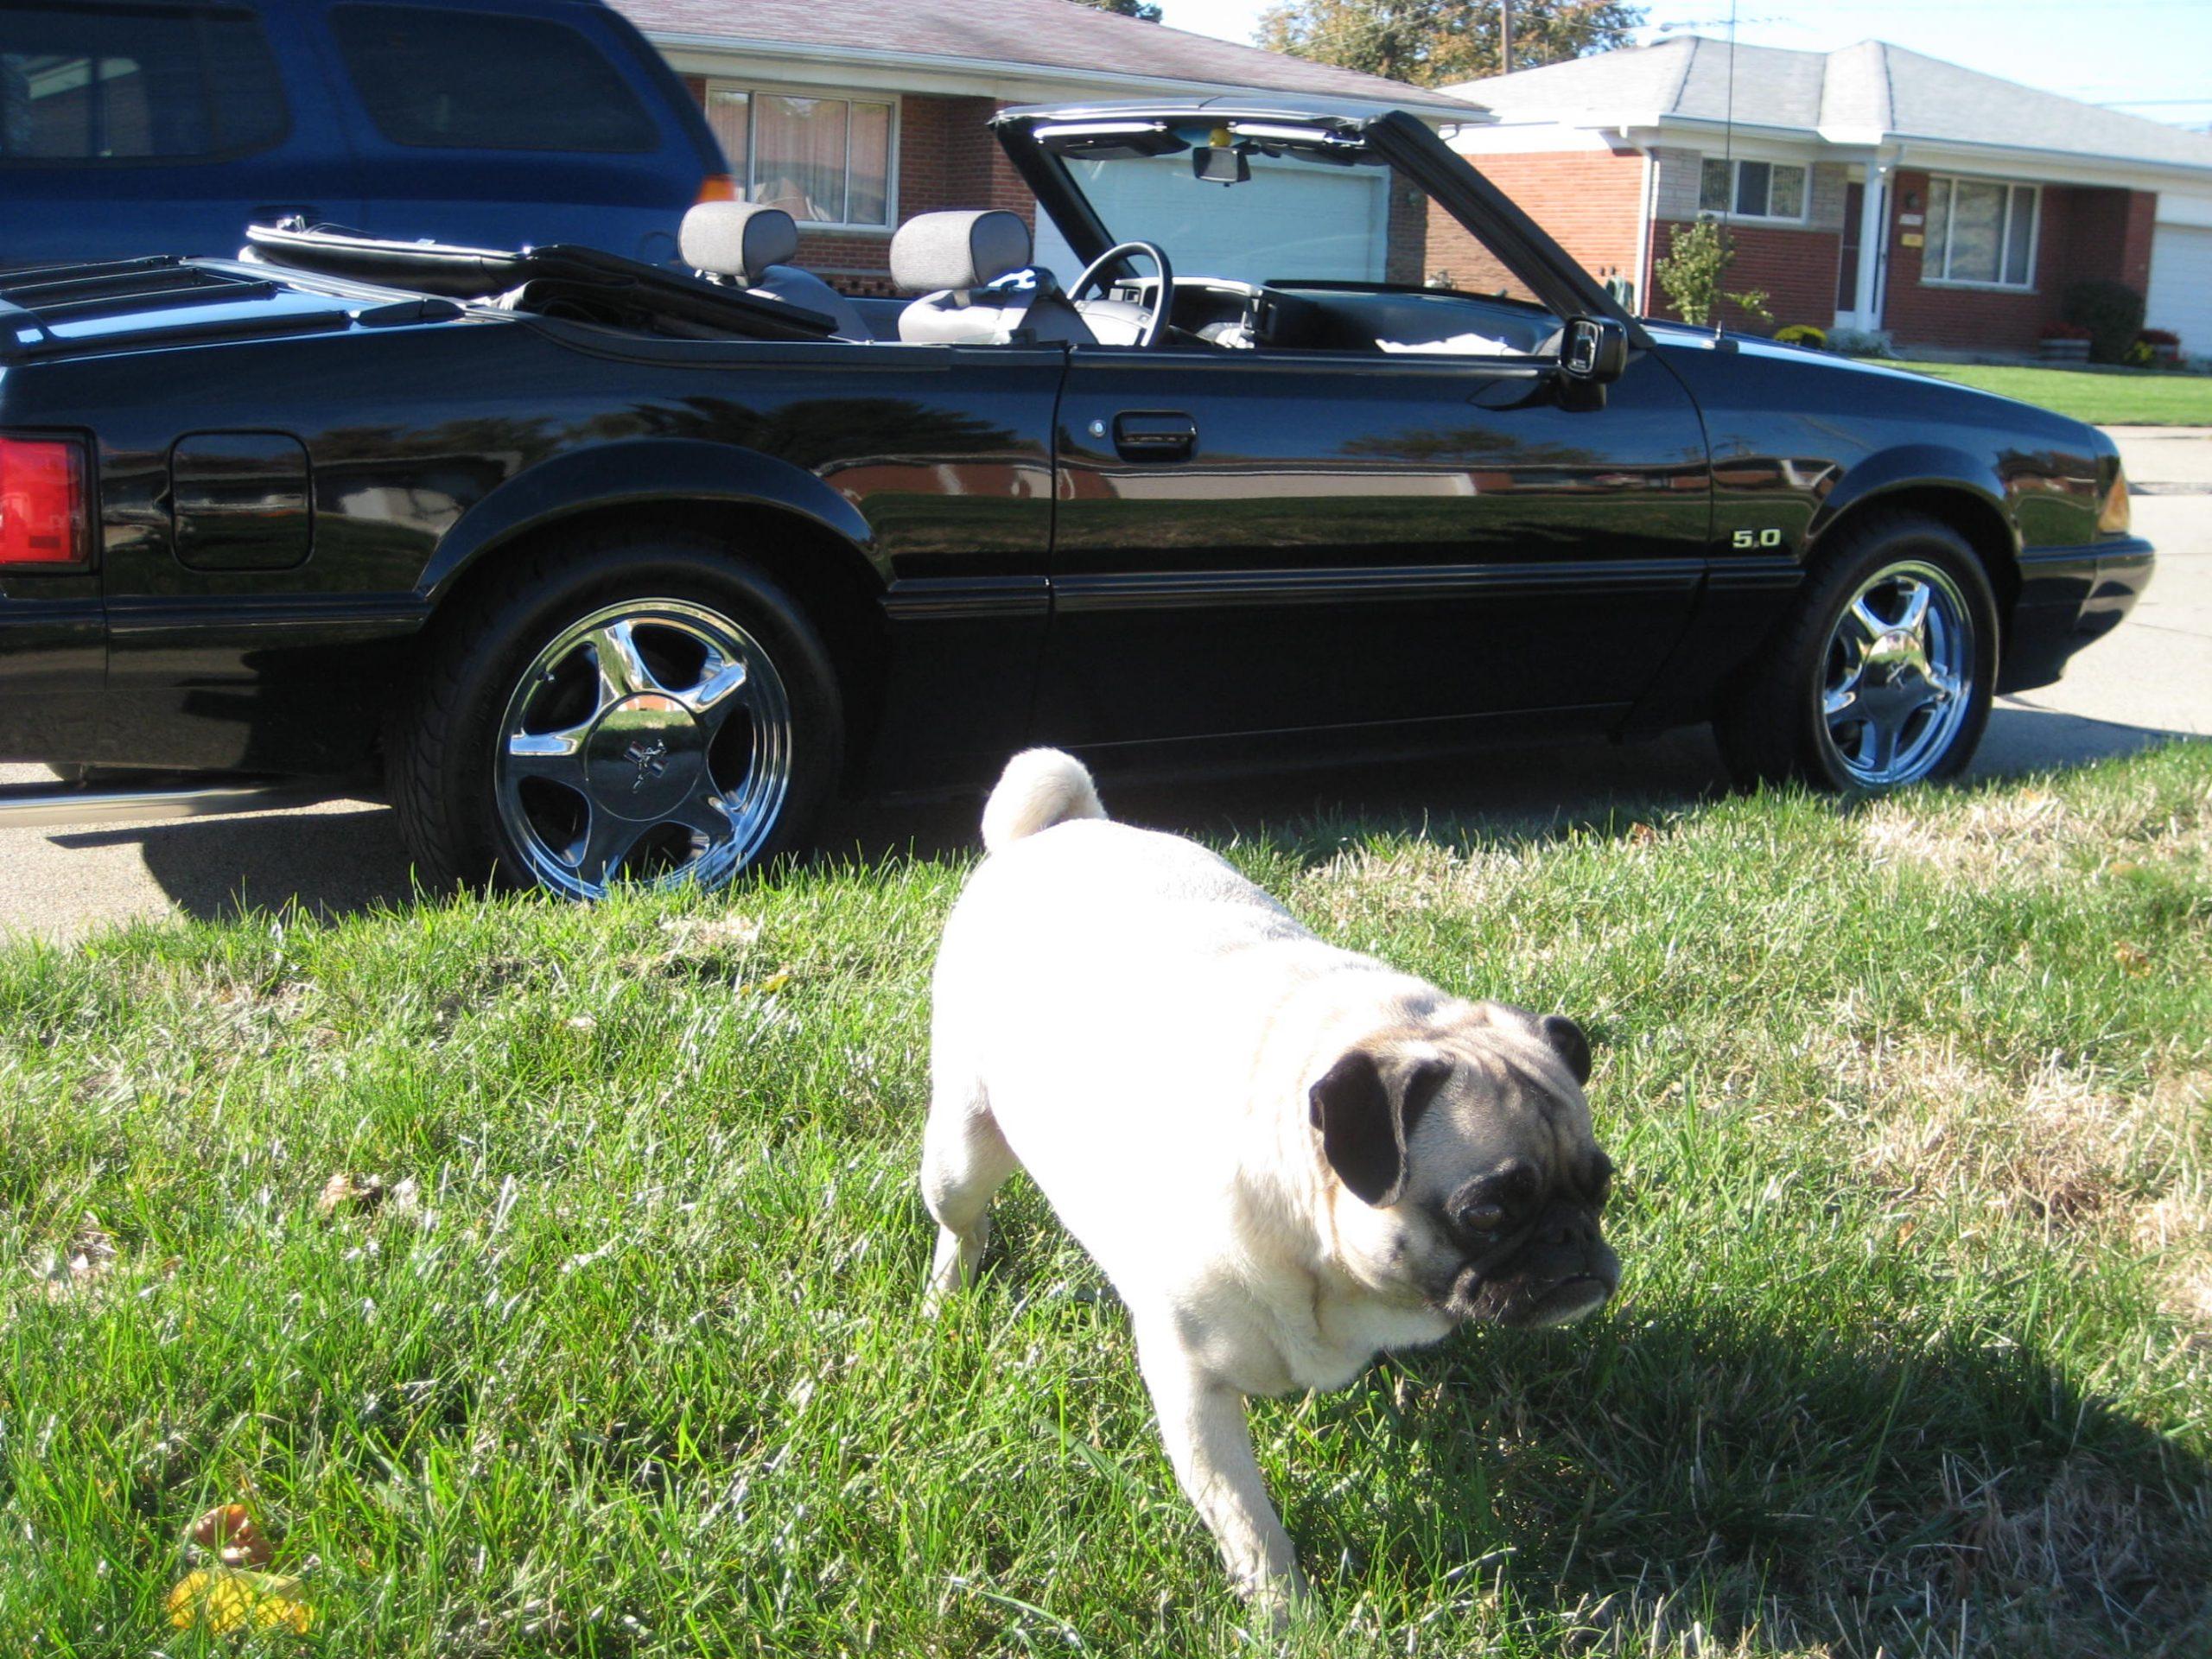 1993 Ford Mustang 5.0 convertible dog